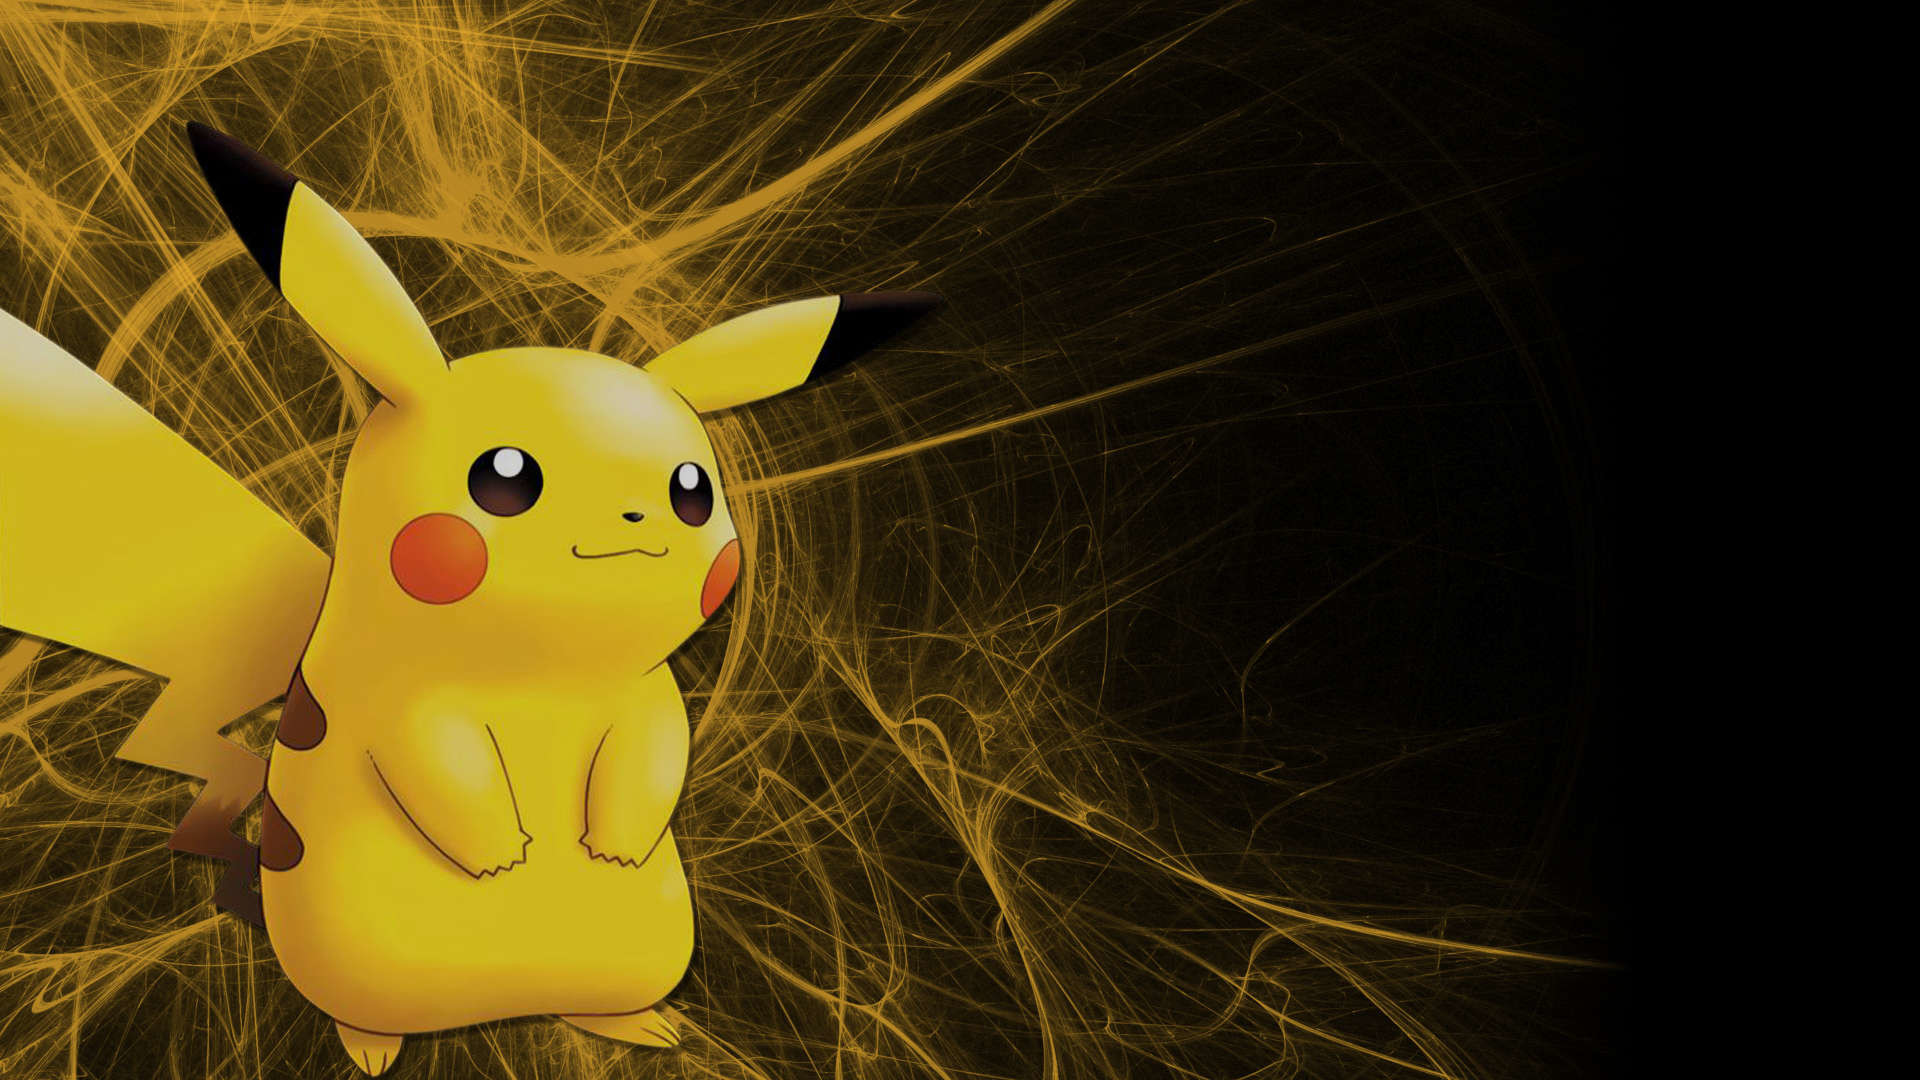 pikachu 1080p wallpaper